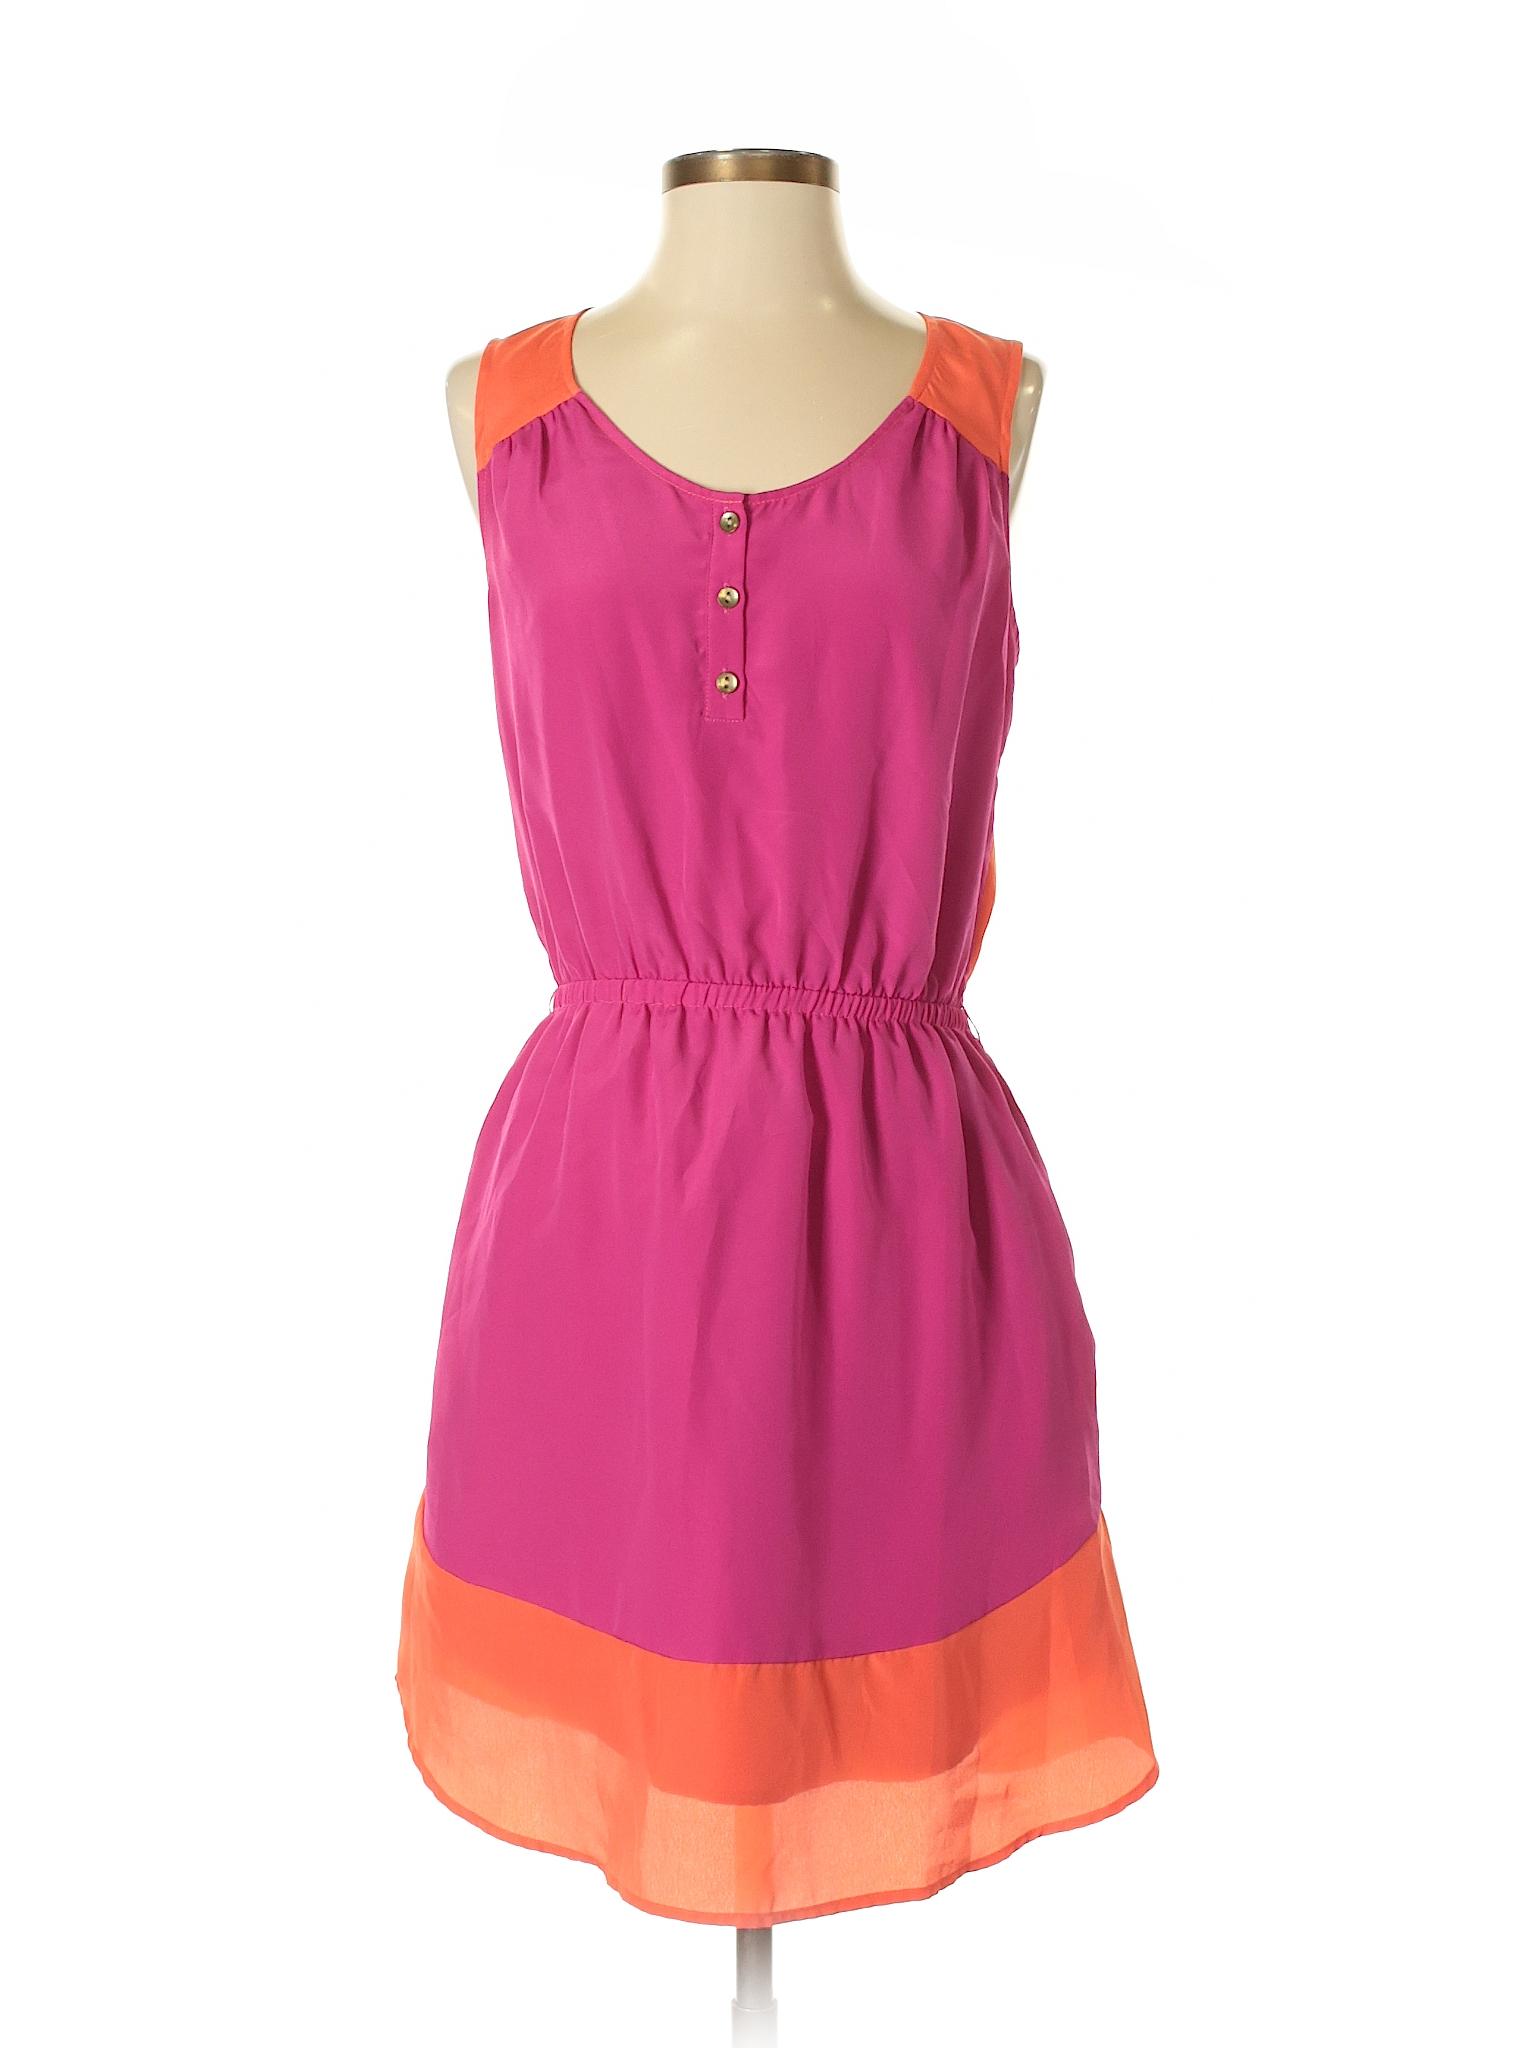 winter Boutique Boutique winter Dress Casual Merona x0PwE8FaqE